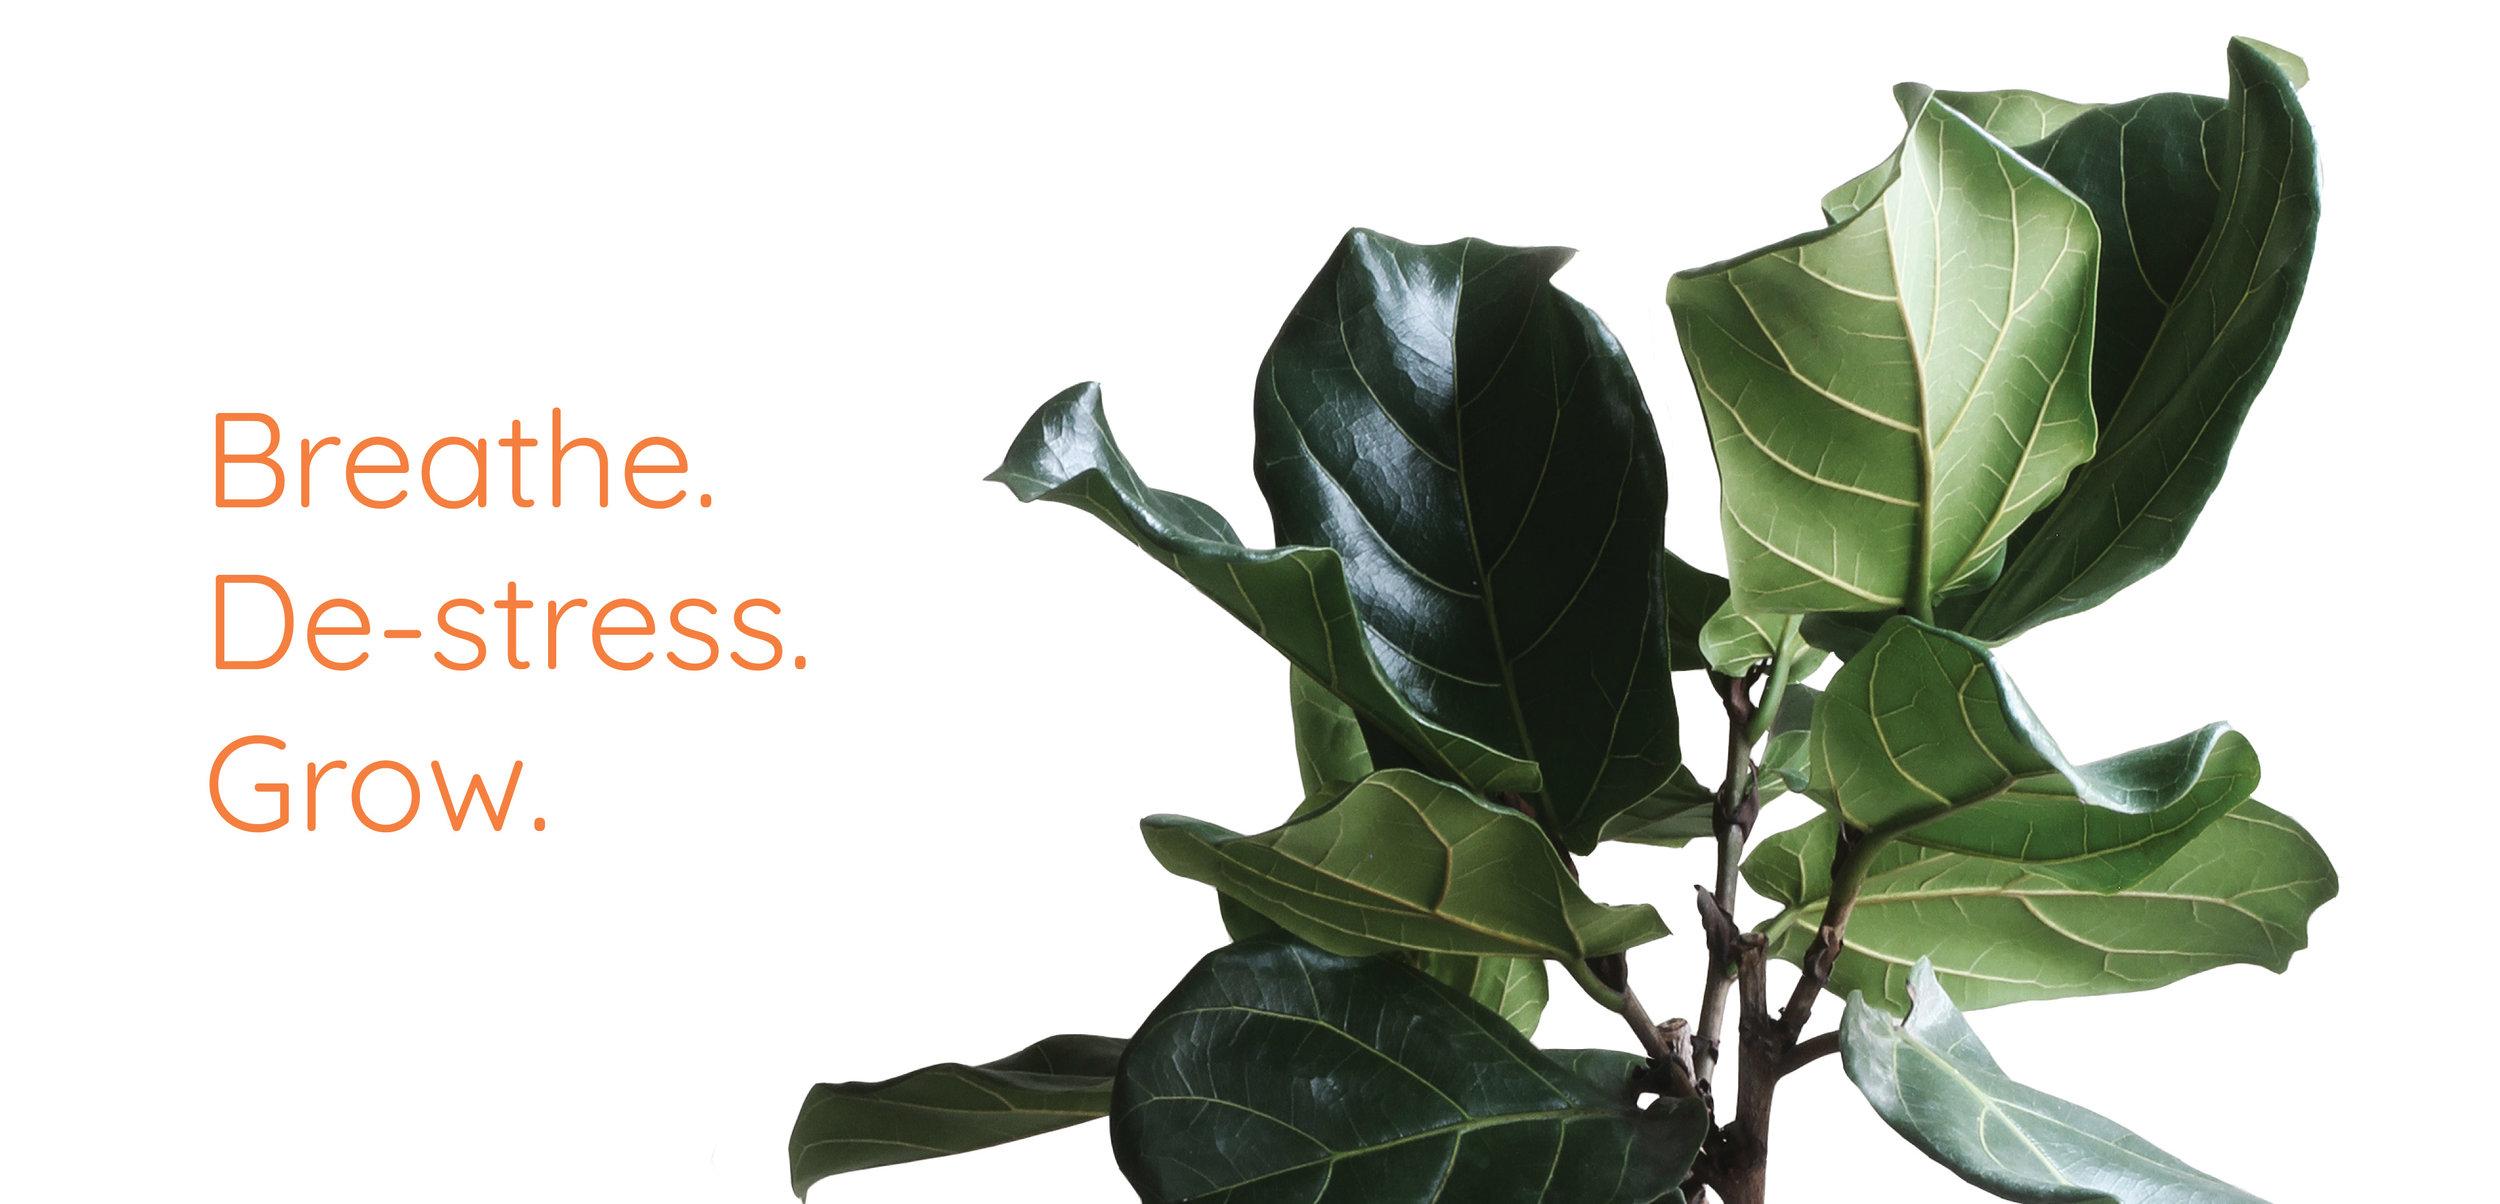 Breathe. Destress. Grow.